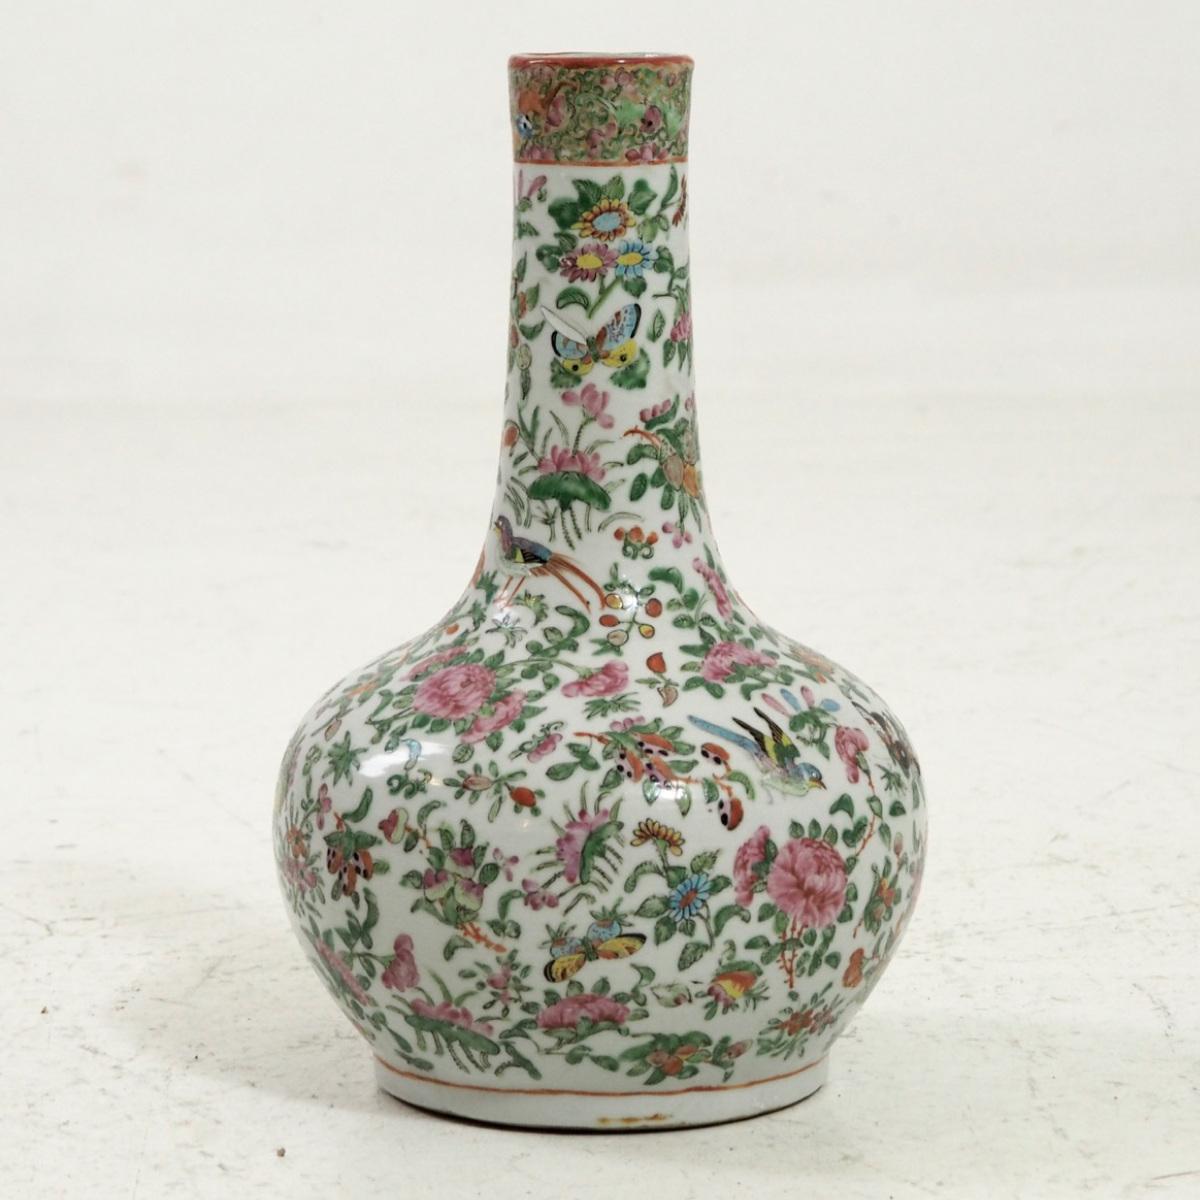 Vase0_srcset-large.jpg